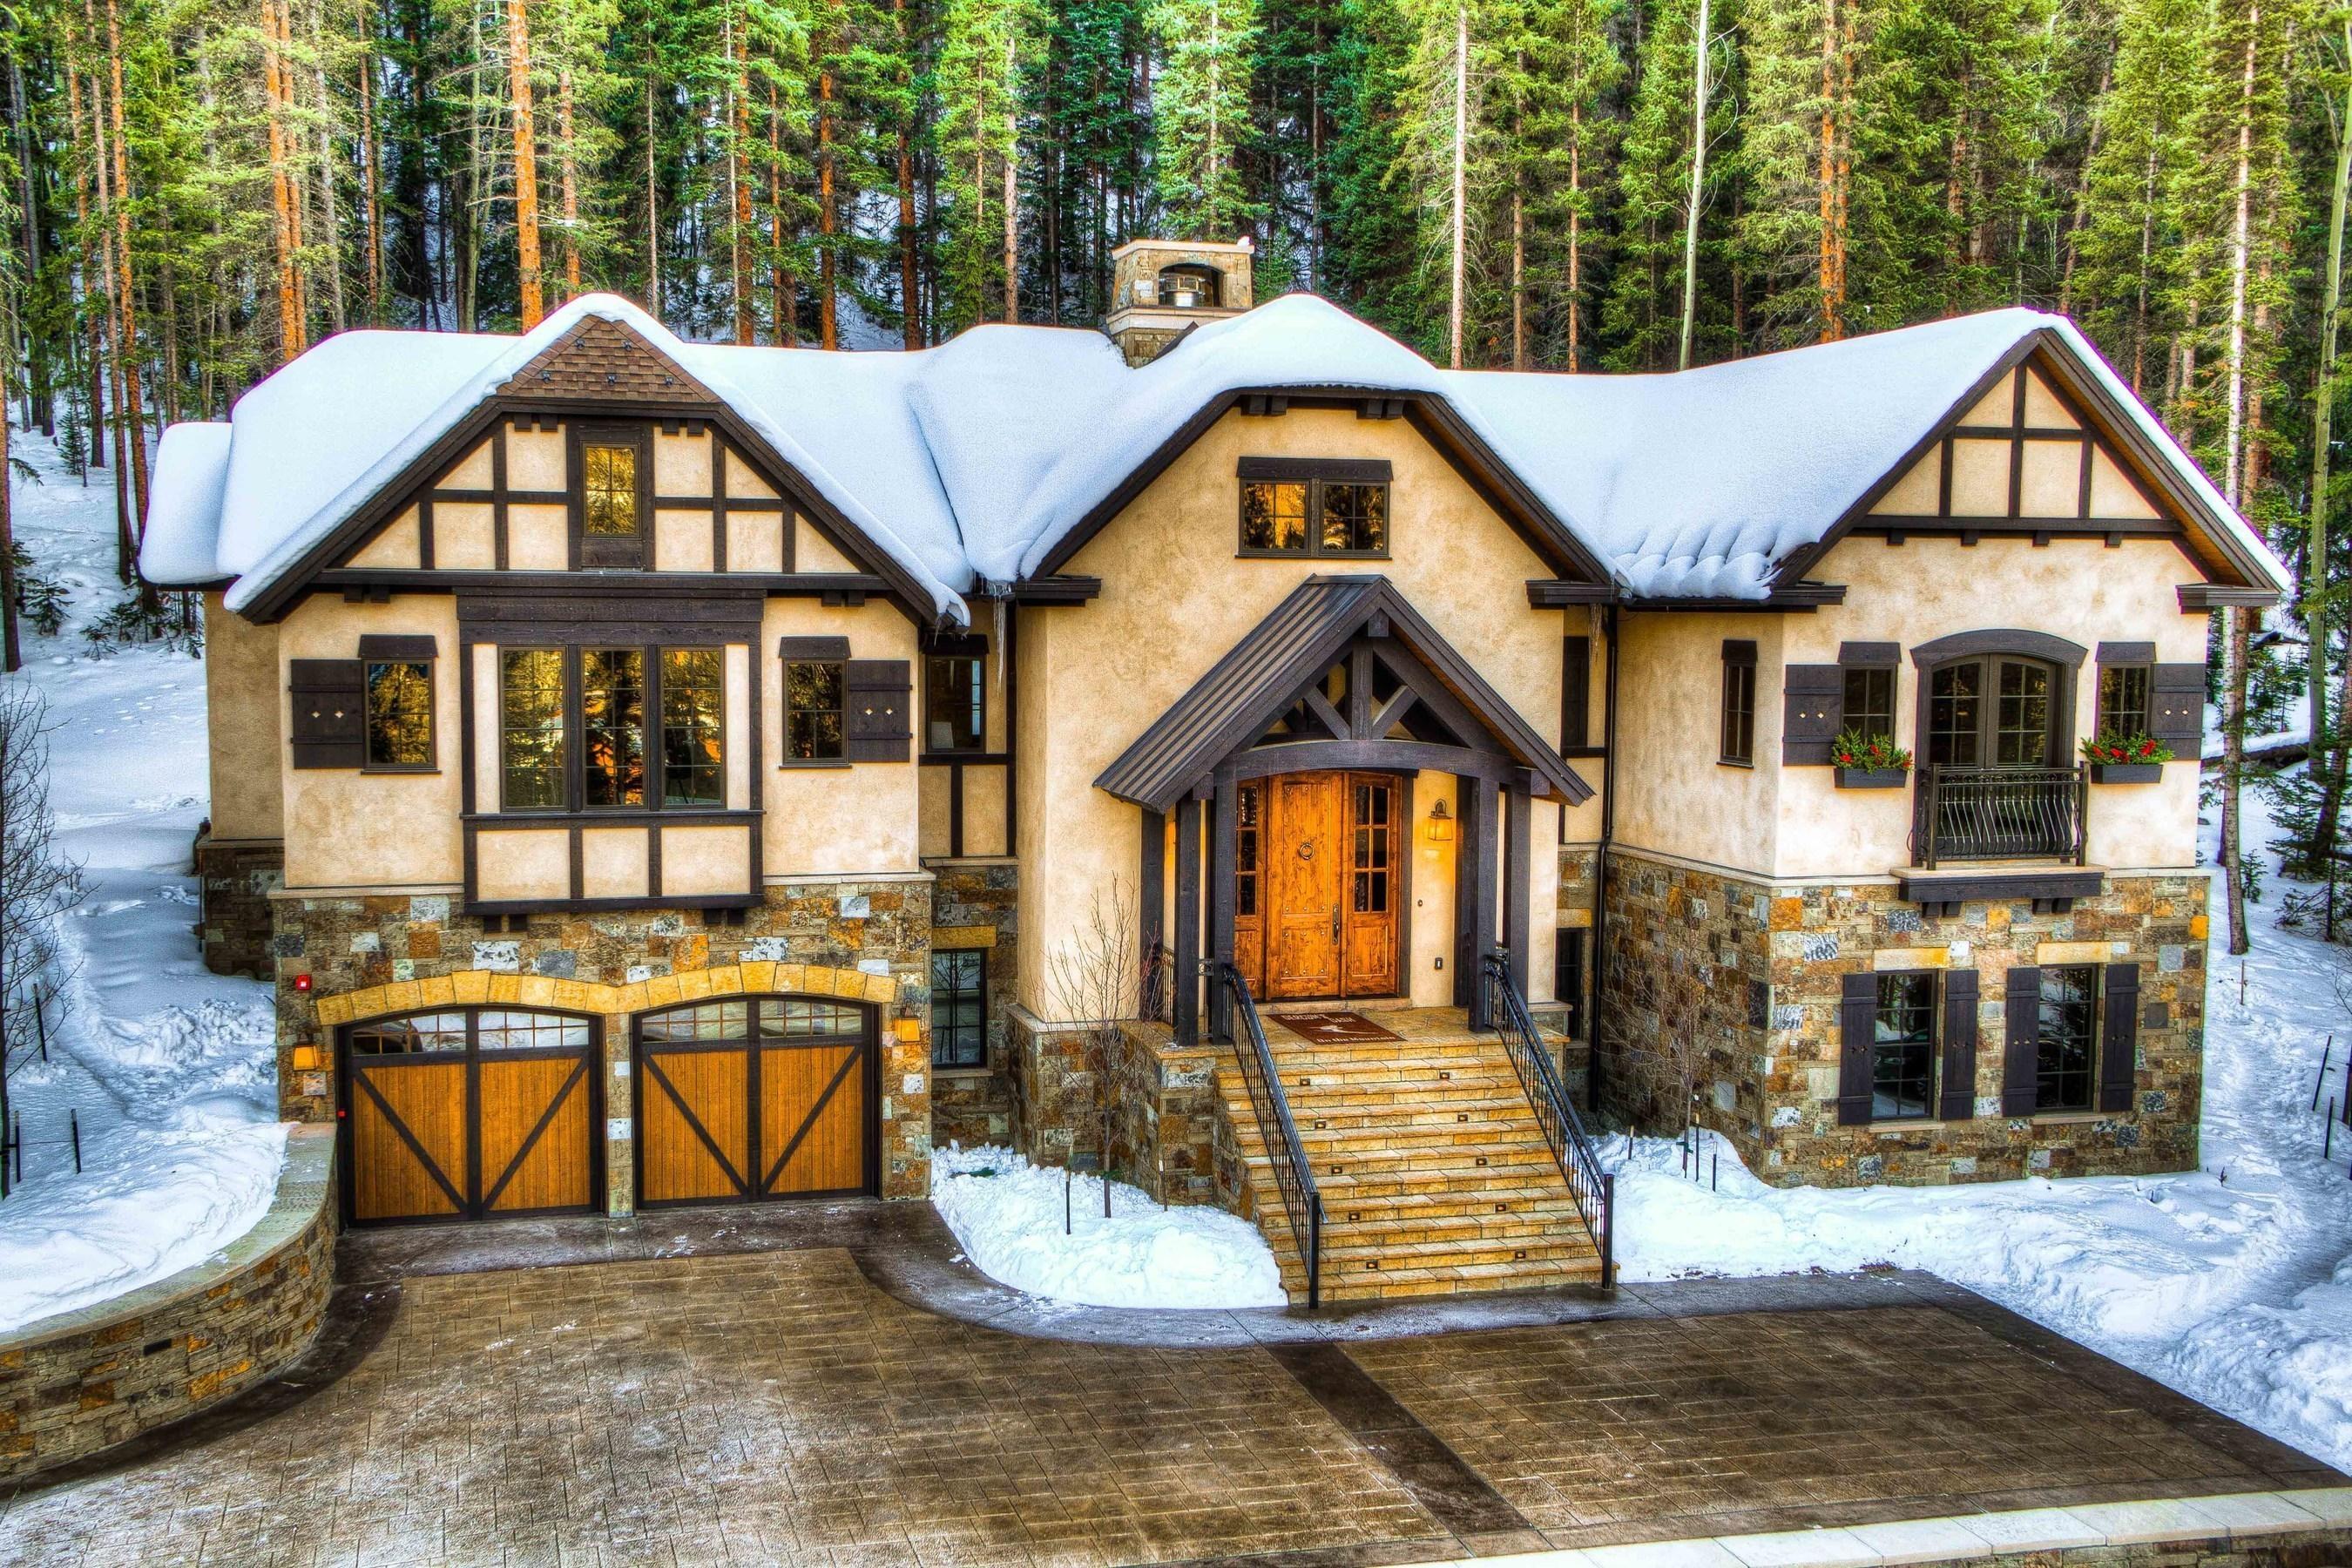 $3 Million Dollar Estate Home Is Keystone's Priciest Sale Since 2007